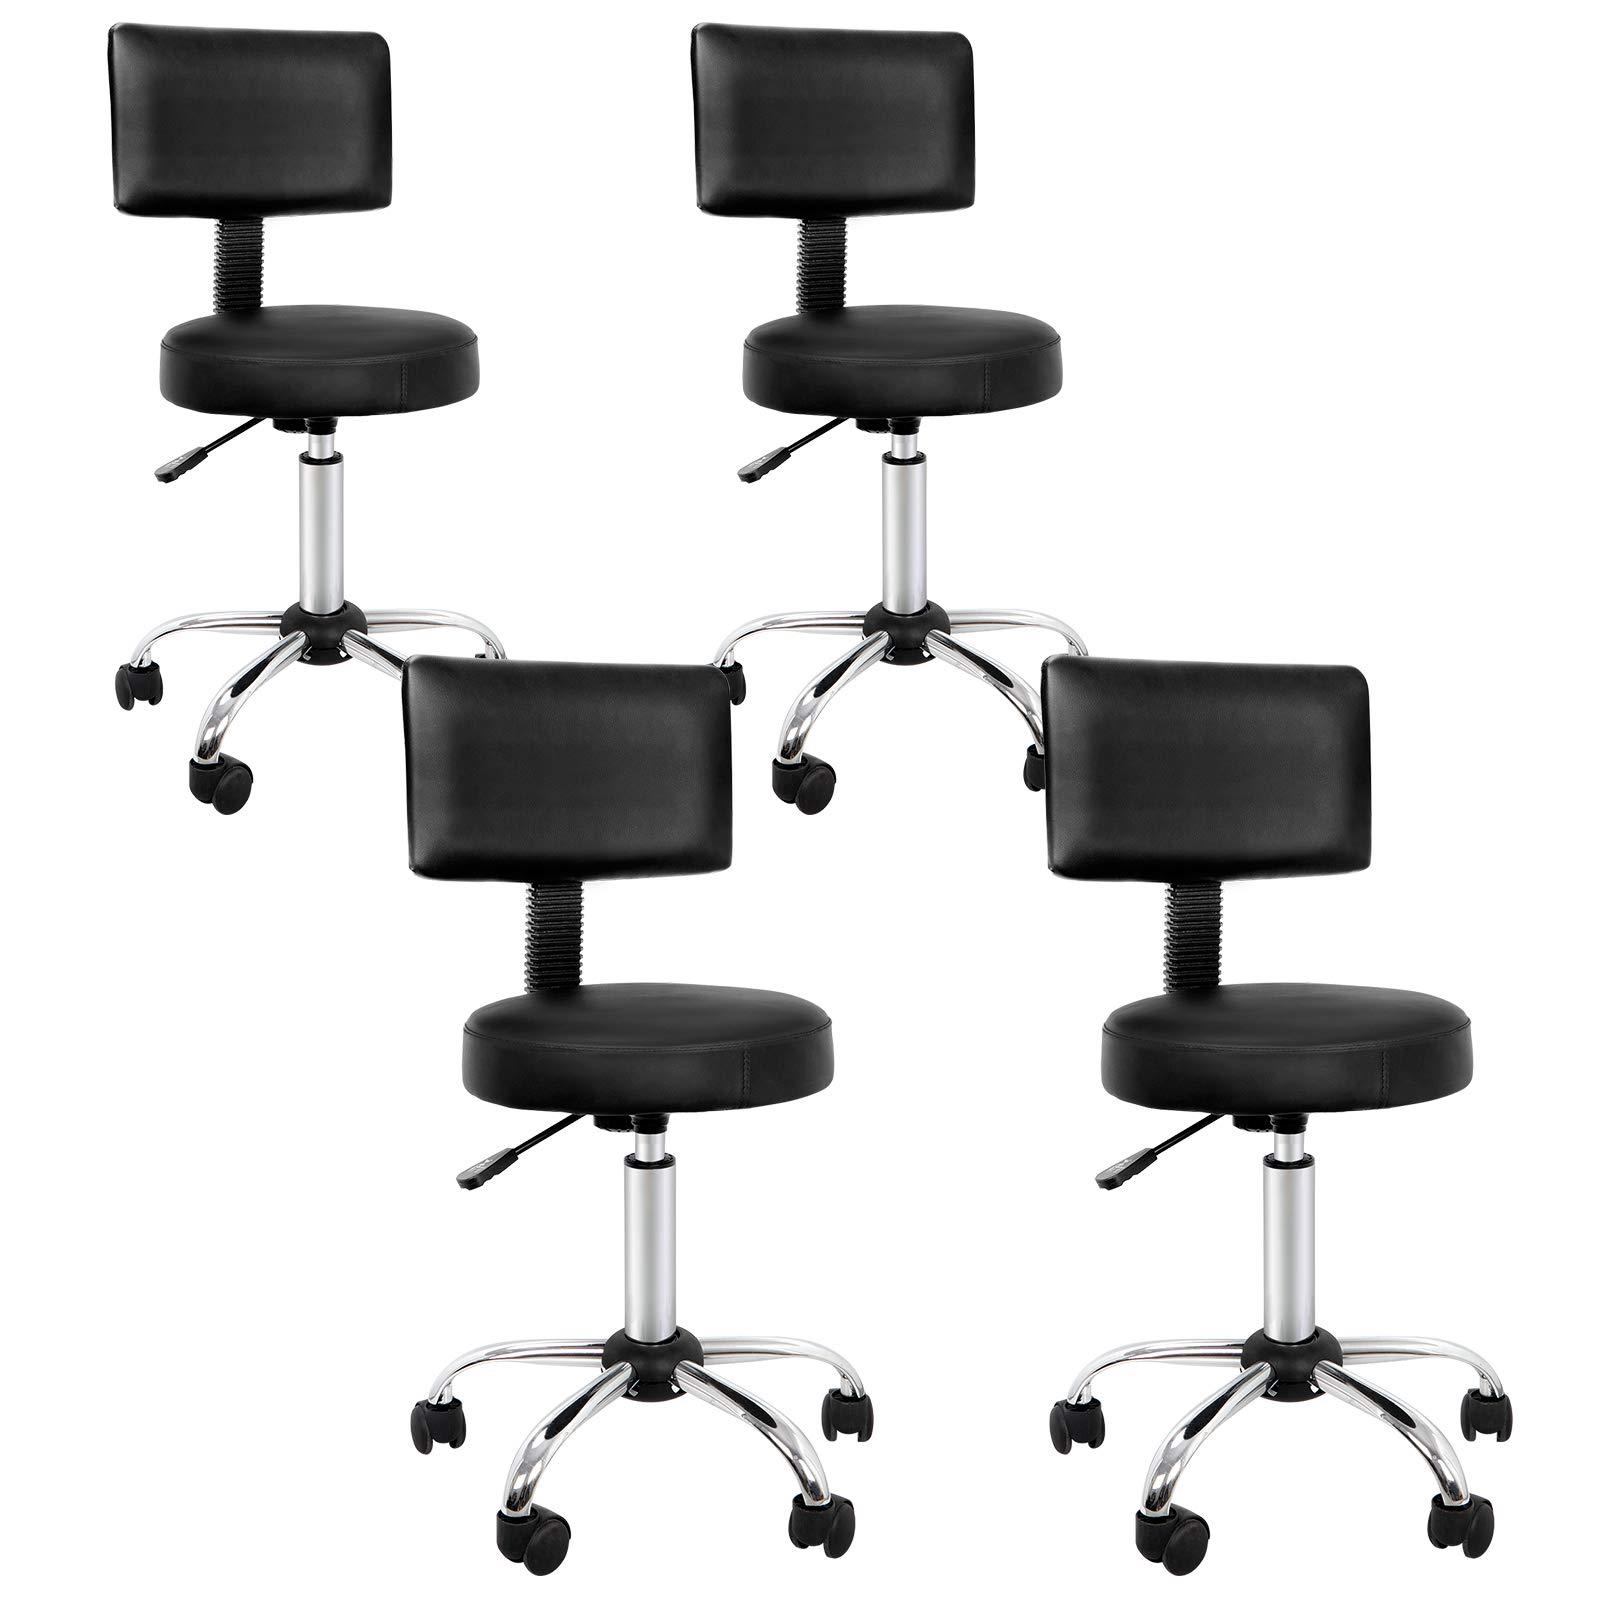 Nova Microdermabrasion Adjustable Hydraulic Rolling Swivel Salon Stool Chair Tattoo Massage Facial Spa Stool Chair with Back (PU Leather Cushion) (Black 4pcs)